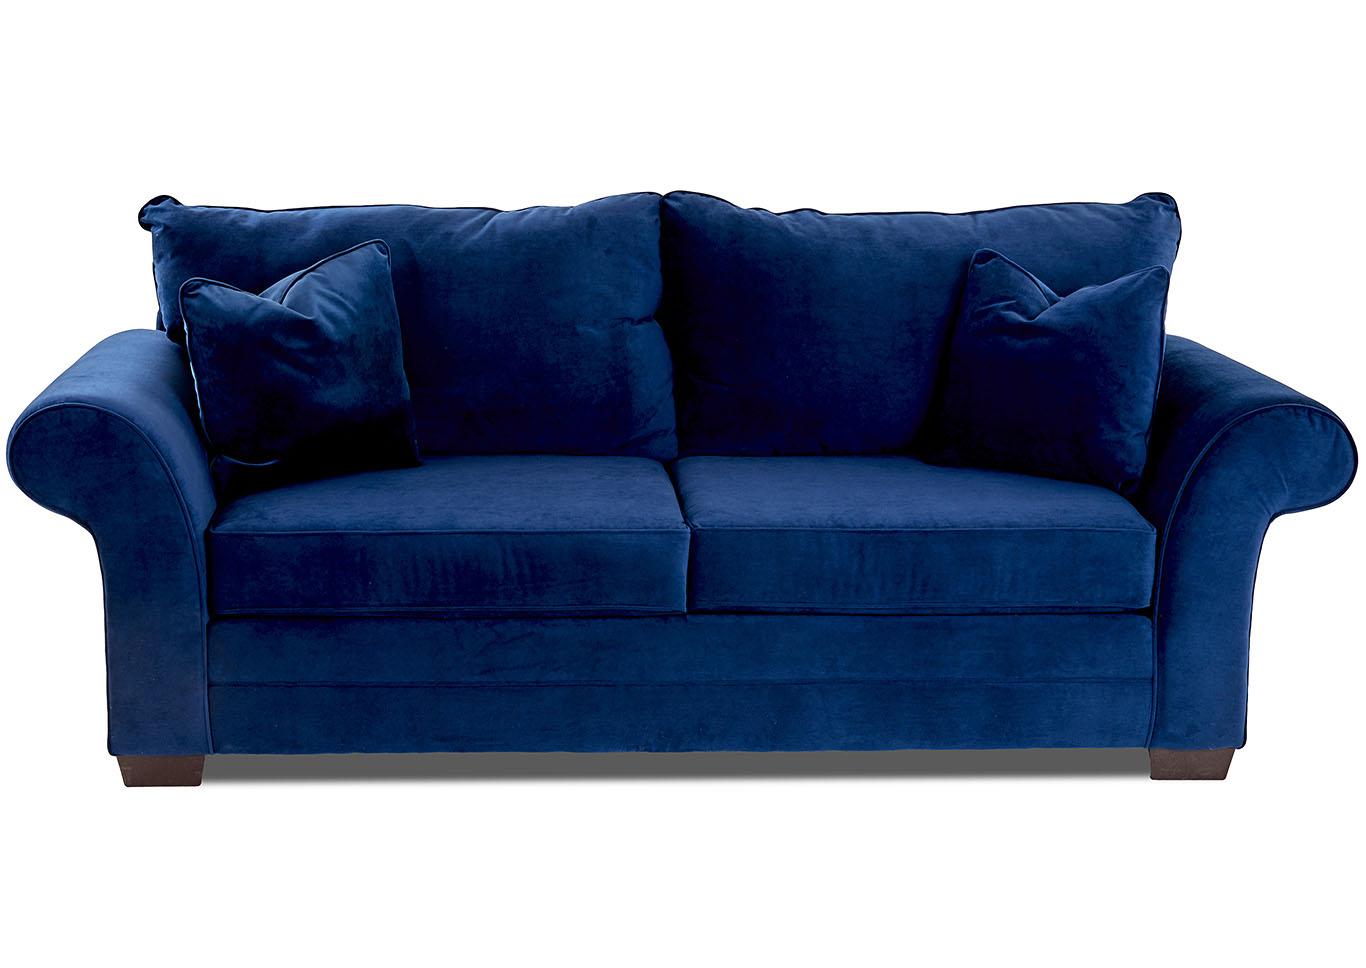 Holly Indigo Blue Stationary Fabric Sofa,Klaussner Home Furnishings